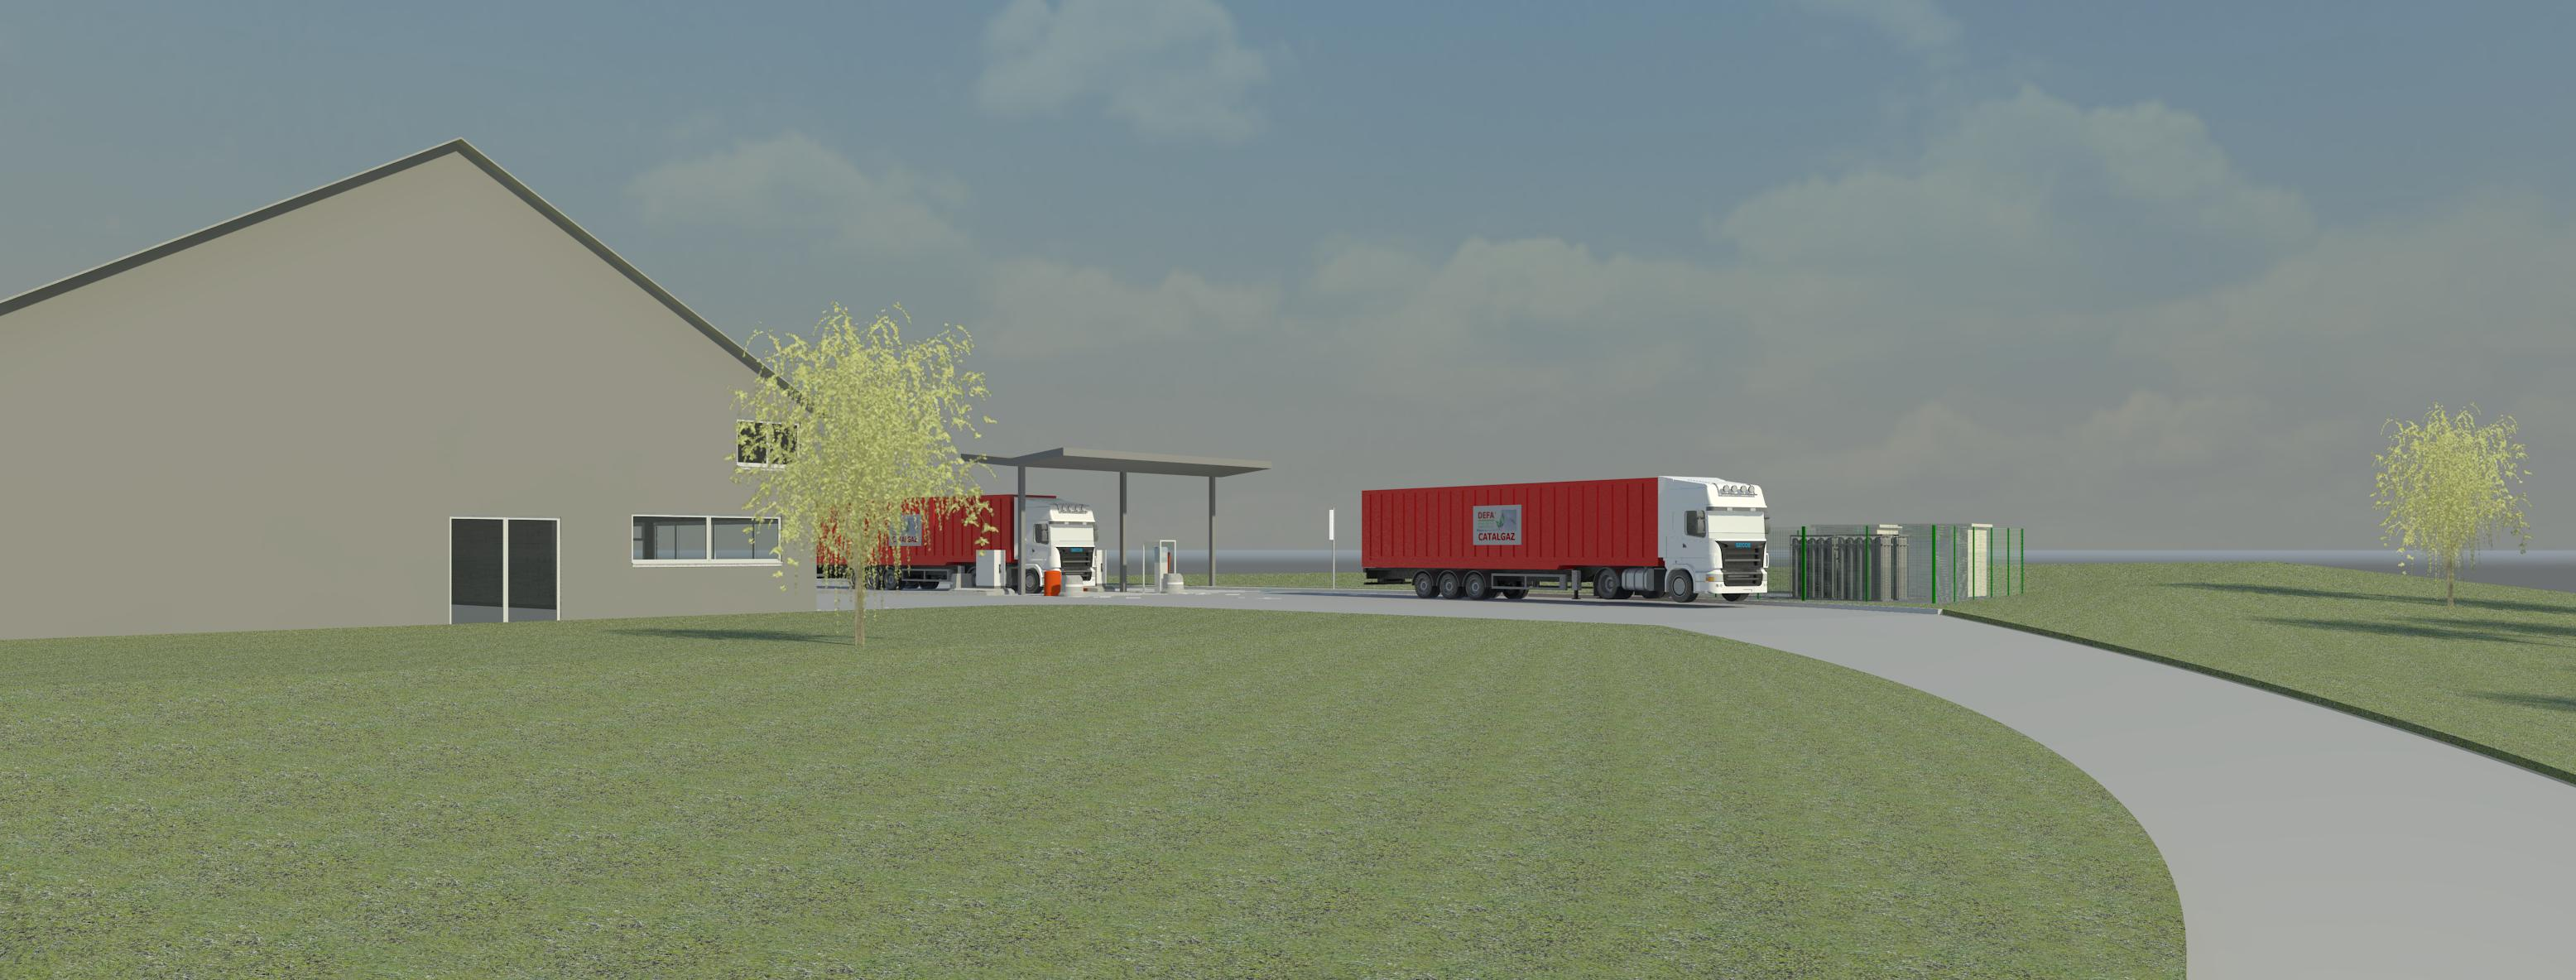 station de distribution de gnv gaz naturel pour v hicules pas cher st girons. Black Bedroom Furniture Sets. Home Design Ideas